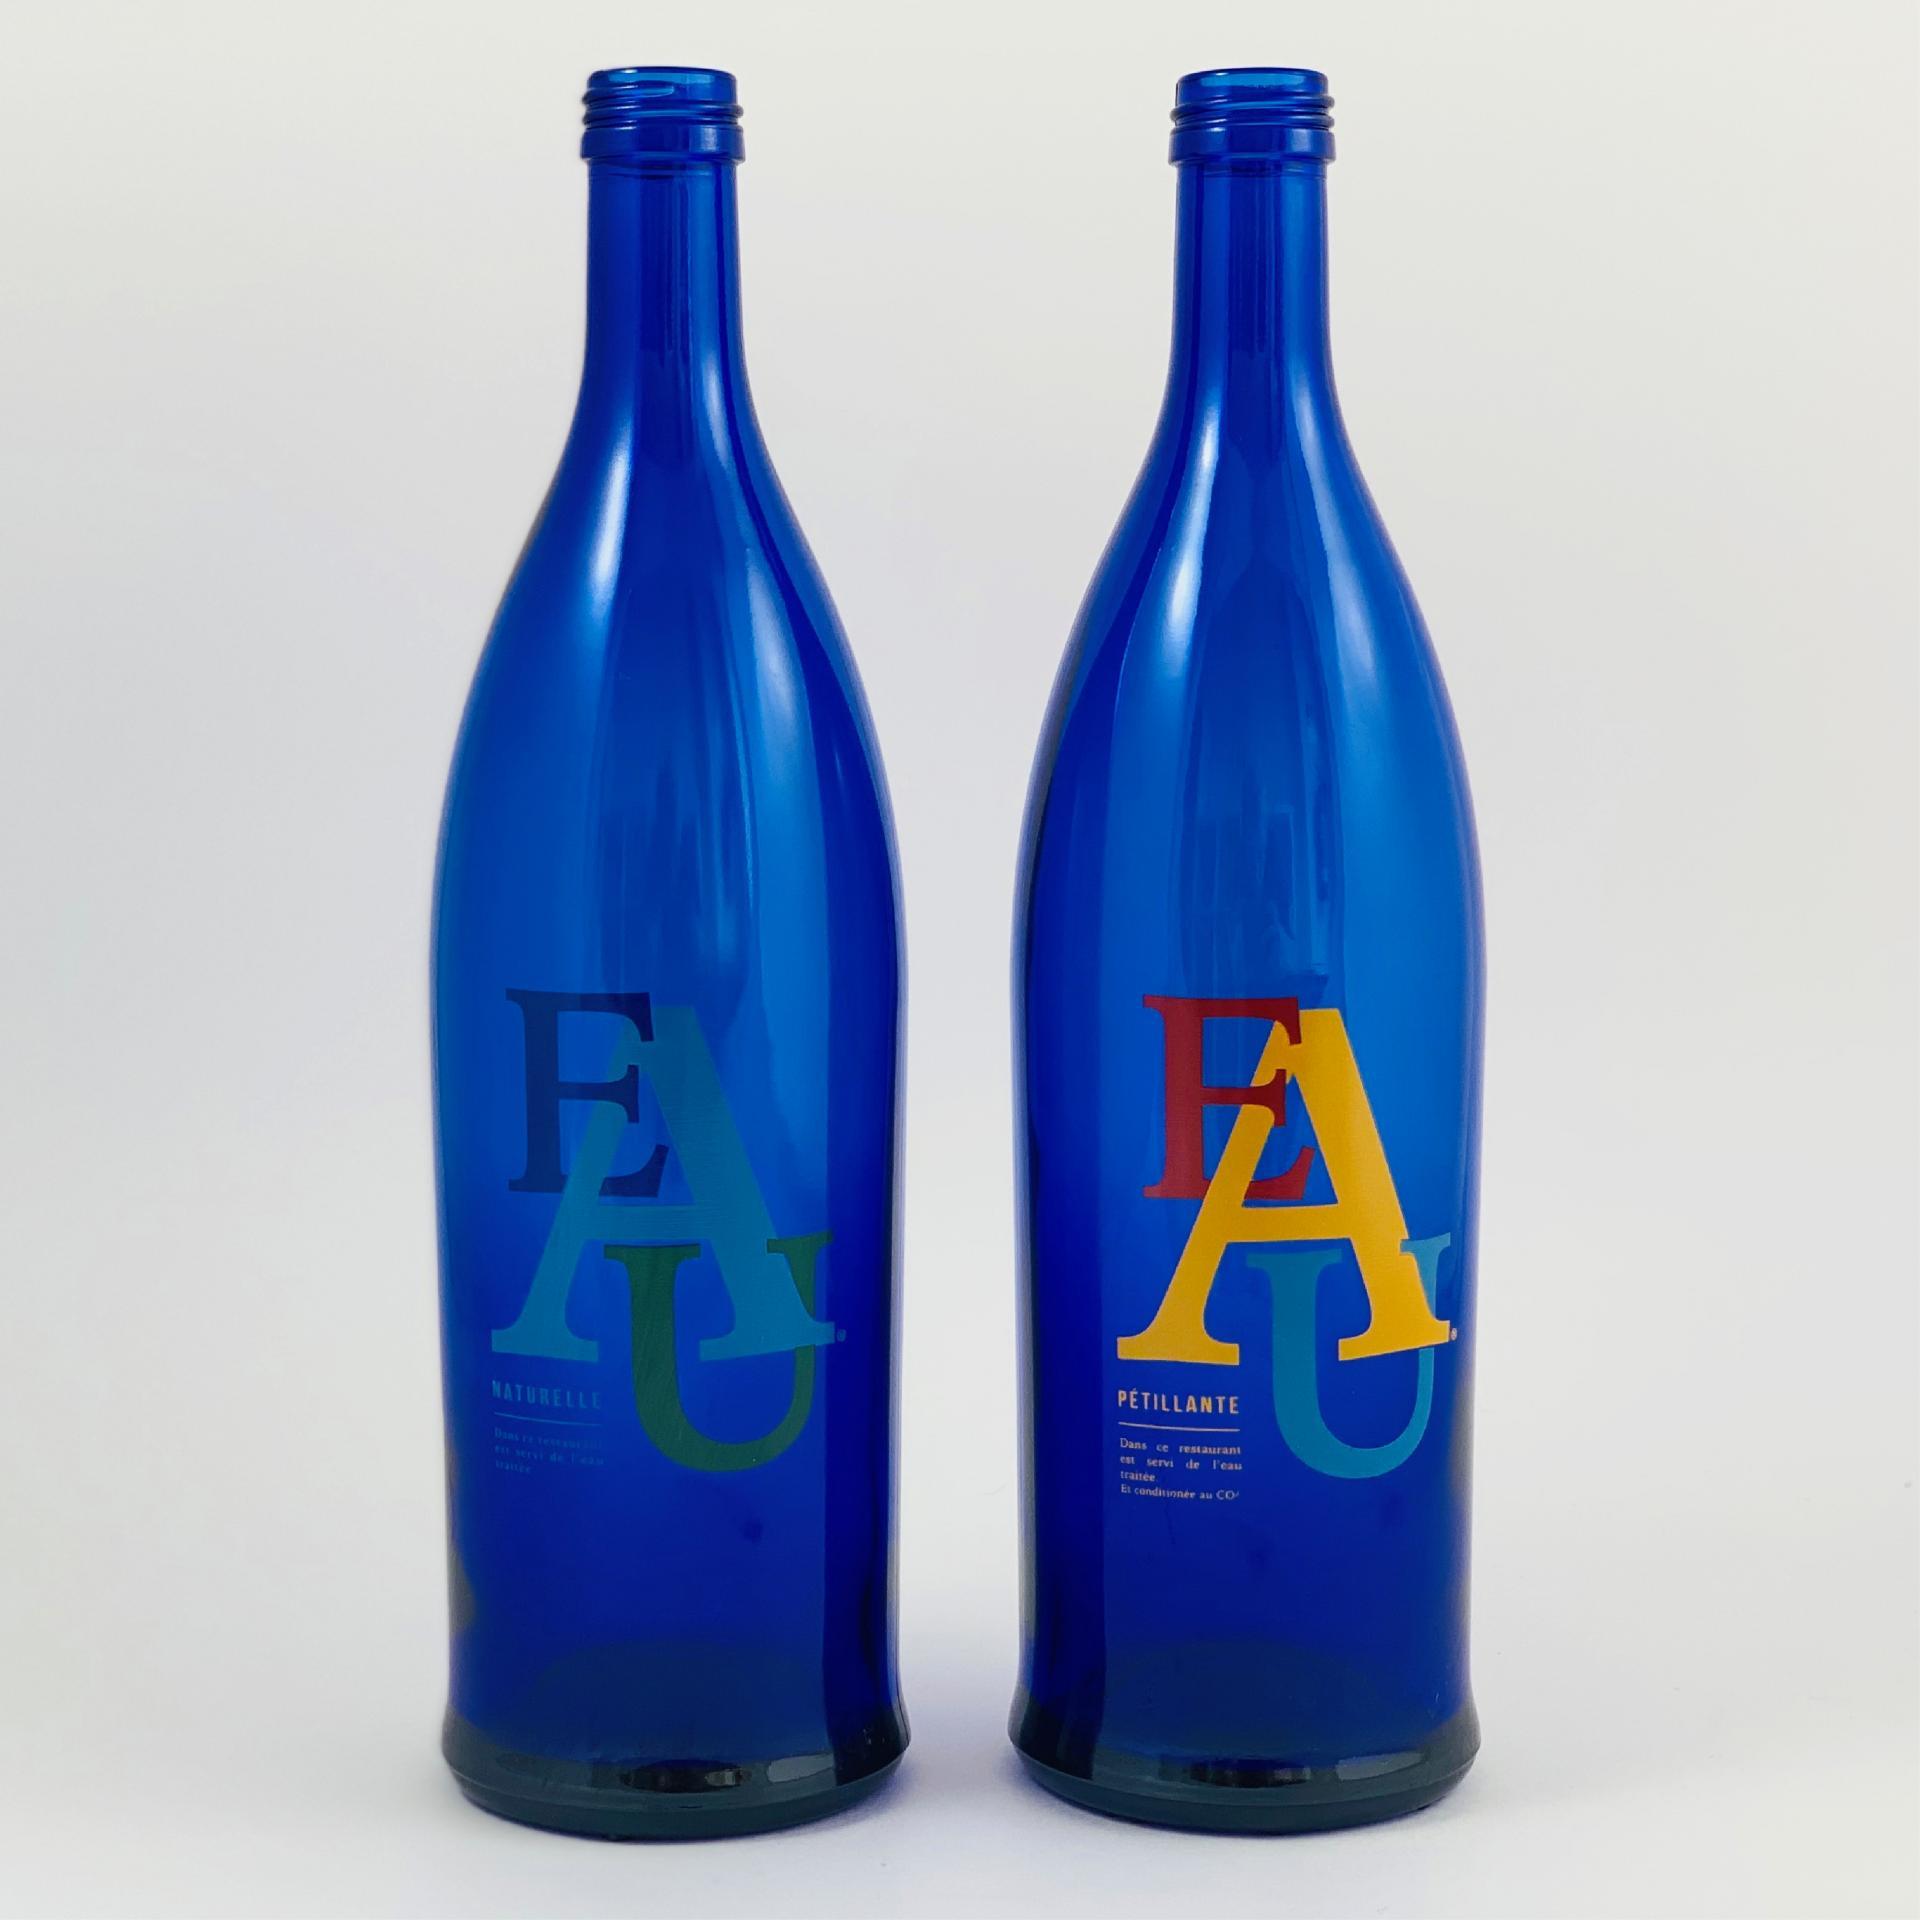 eau-gea-blu,4441?WebbinsCacheCounter=1